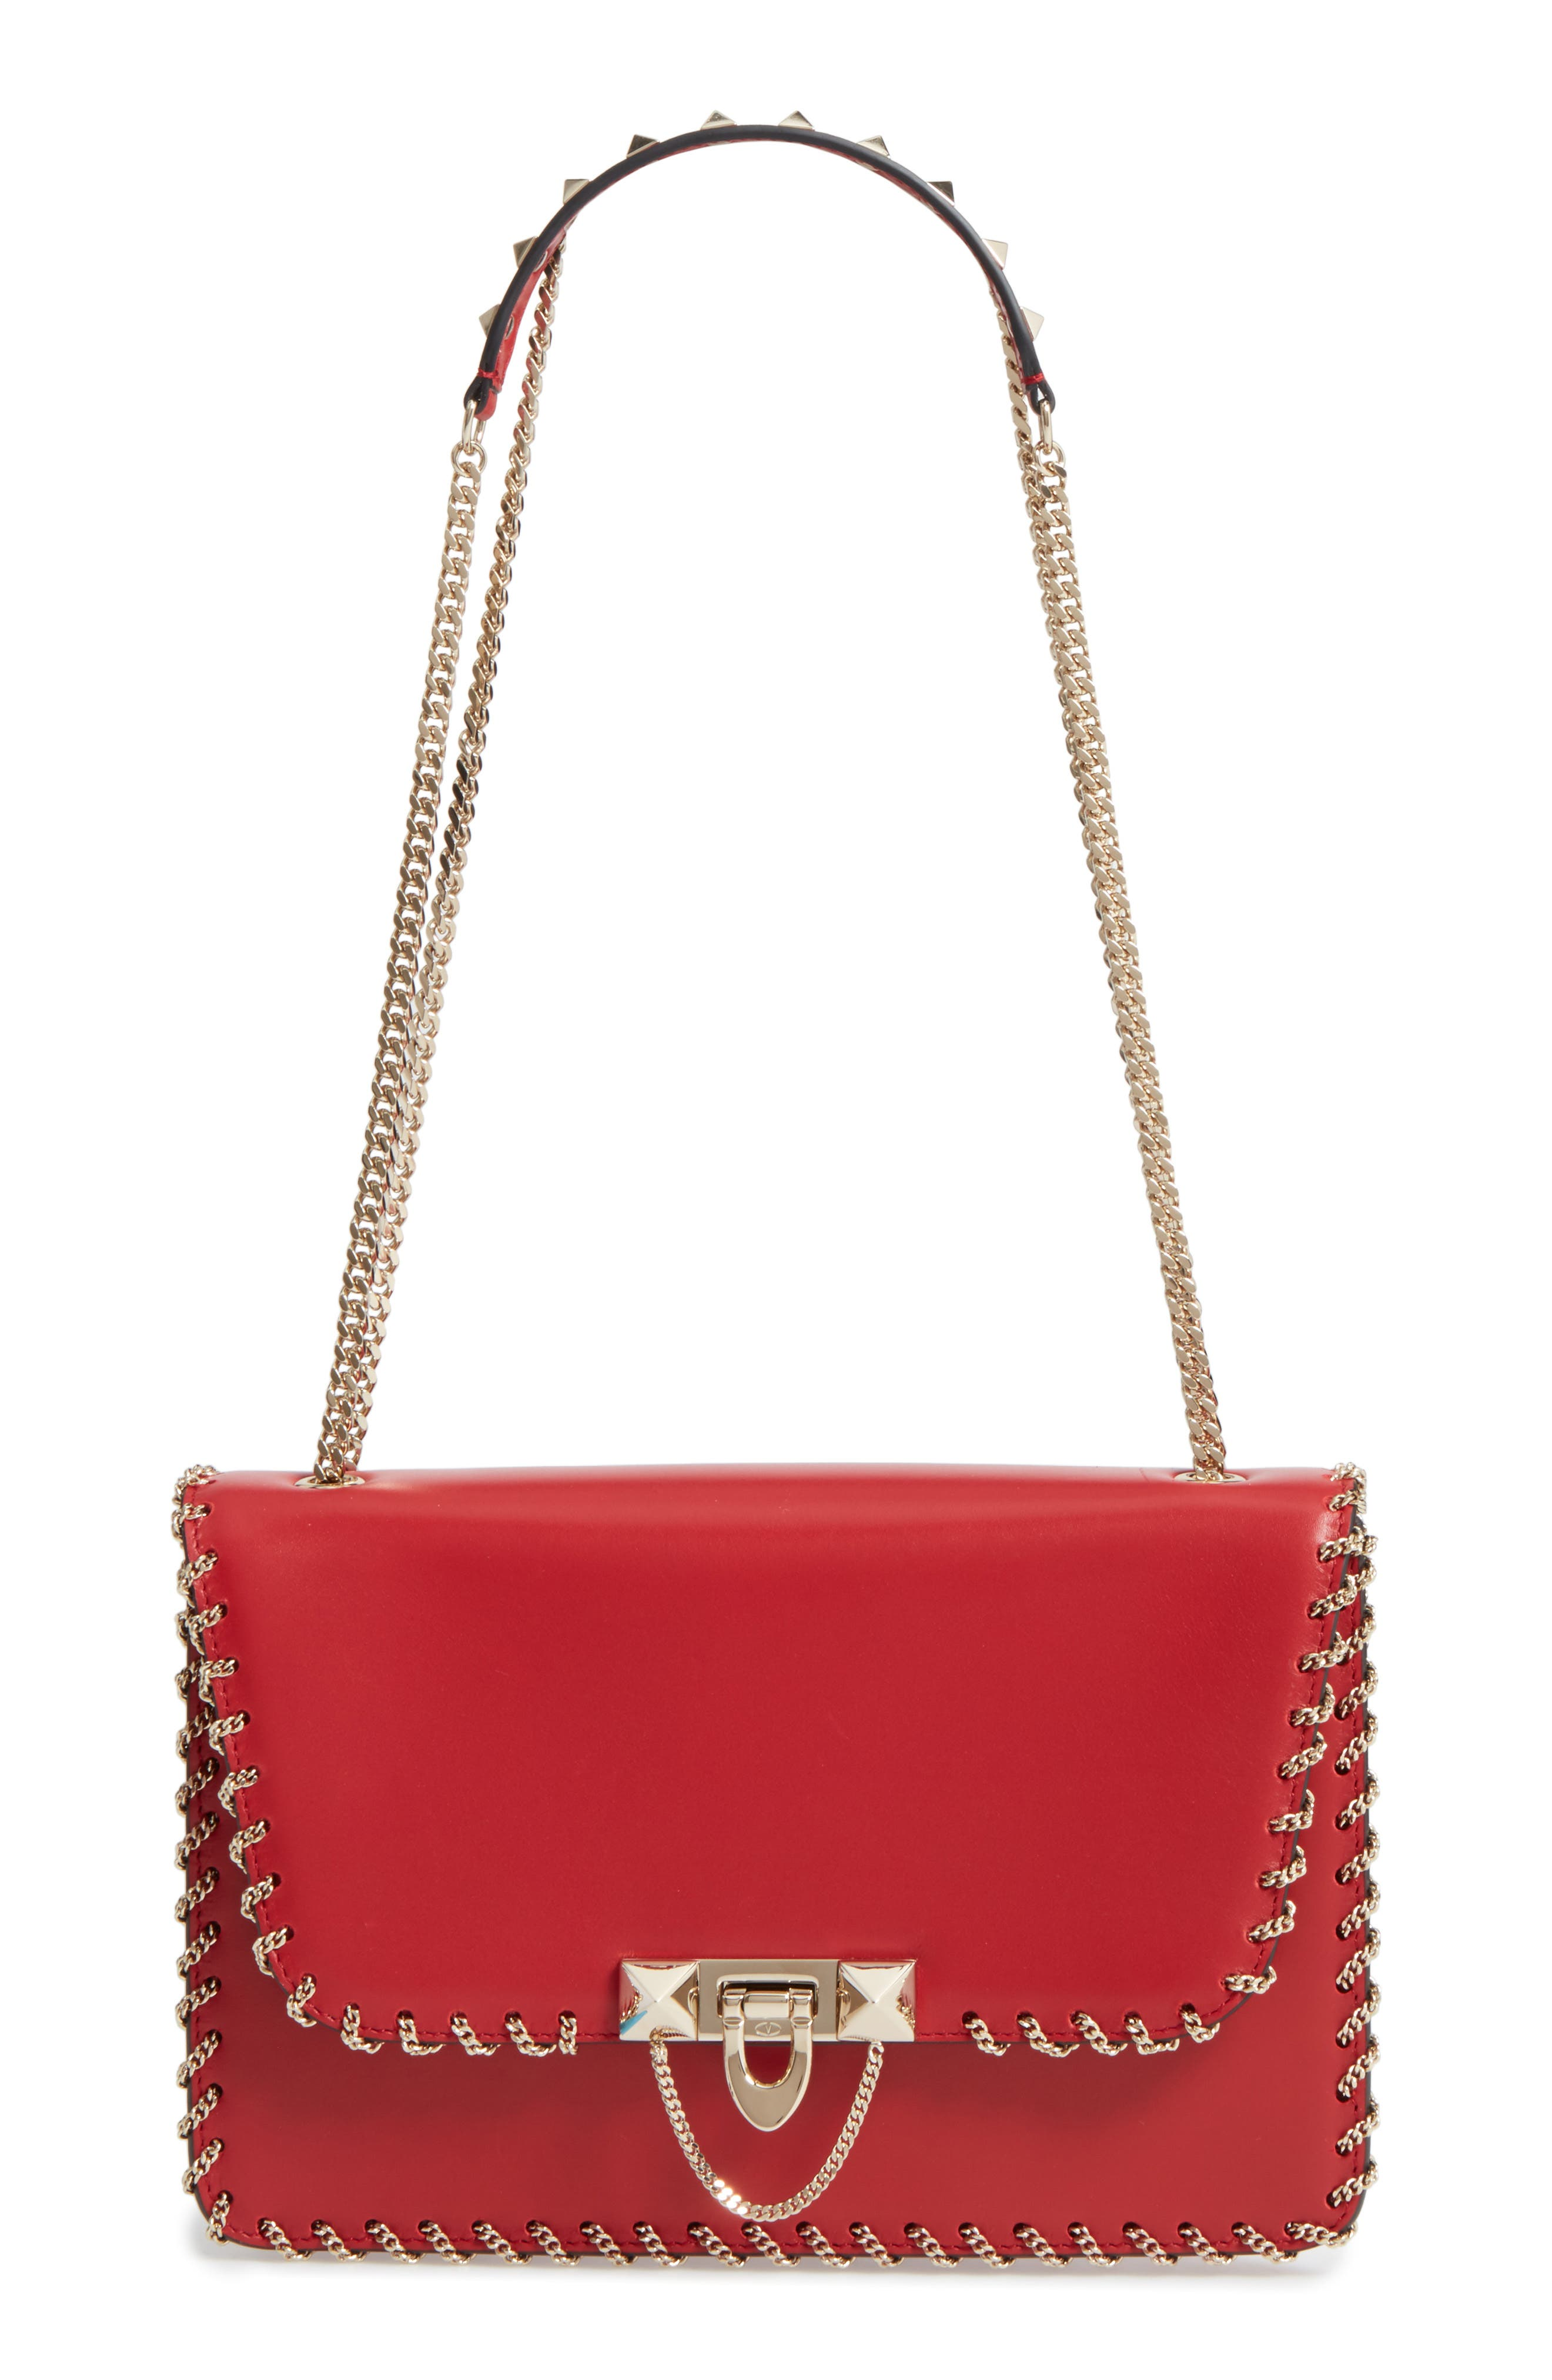 VALENTINO GARAVANI Demilune Whipstitch Leather Shoulder Bag